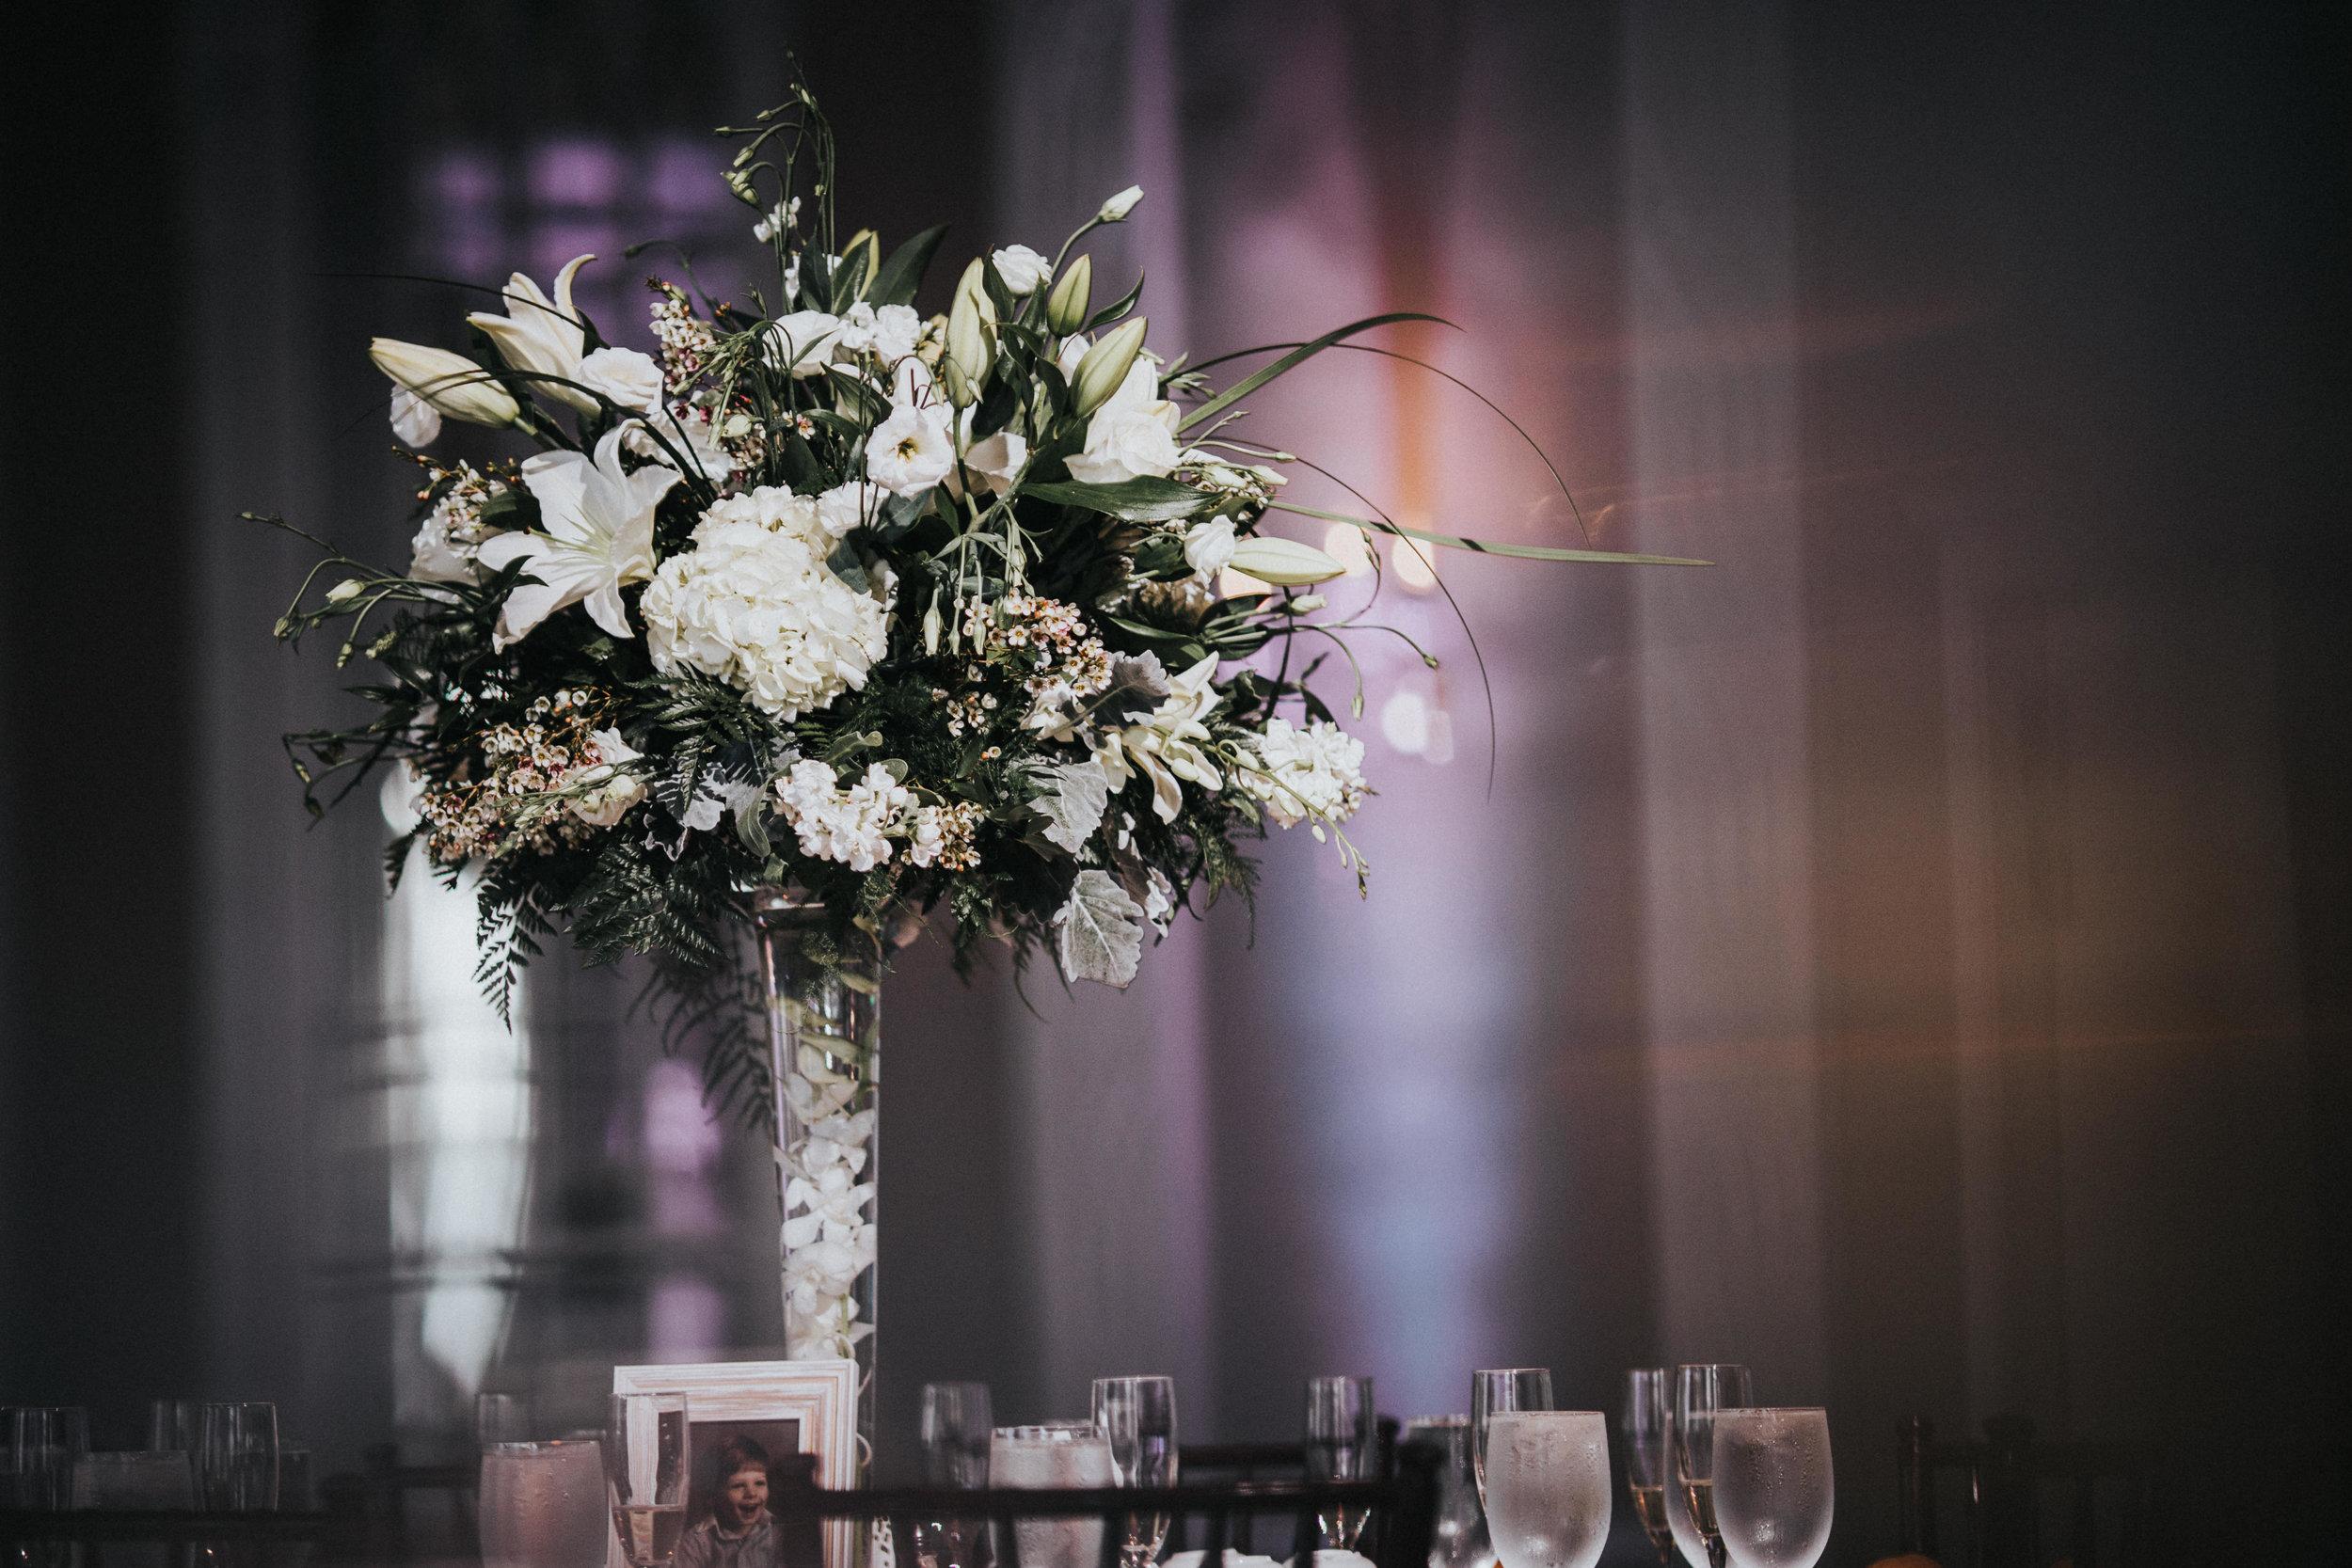 JennaLynnPhotography-NJWeddingPhotographer-Wedding-TheBerkeley-AsburyPark-Allison&Michael-Details-18.jpg